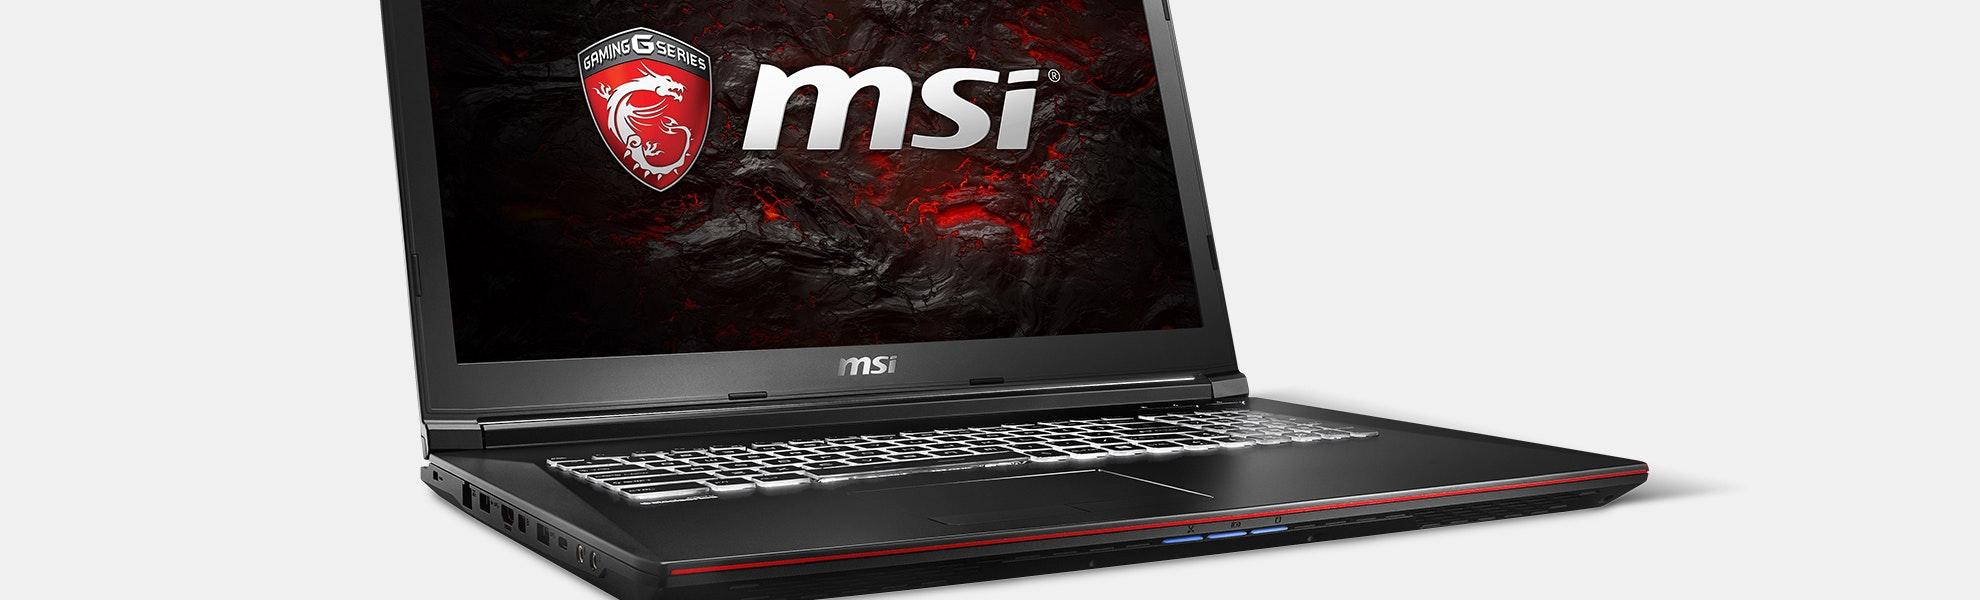 MSI GP72VR Leopard Pro-281 Gaming Laptop 120Hz